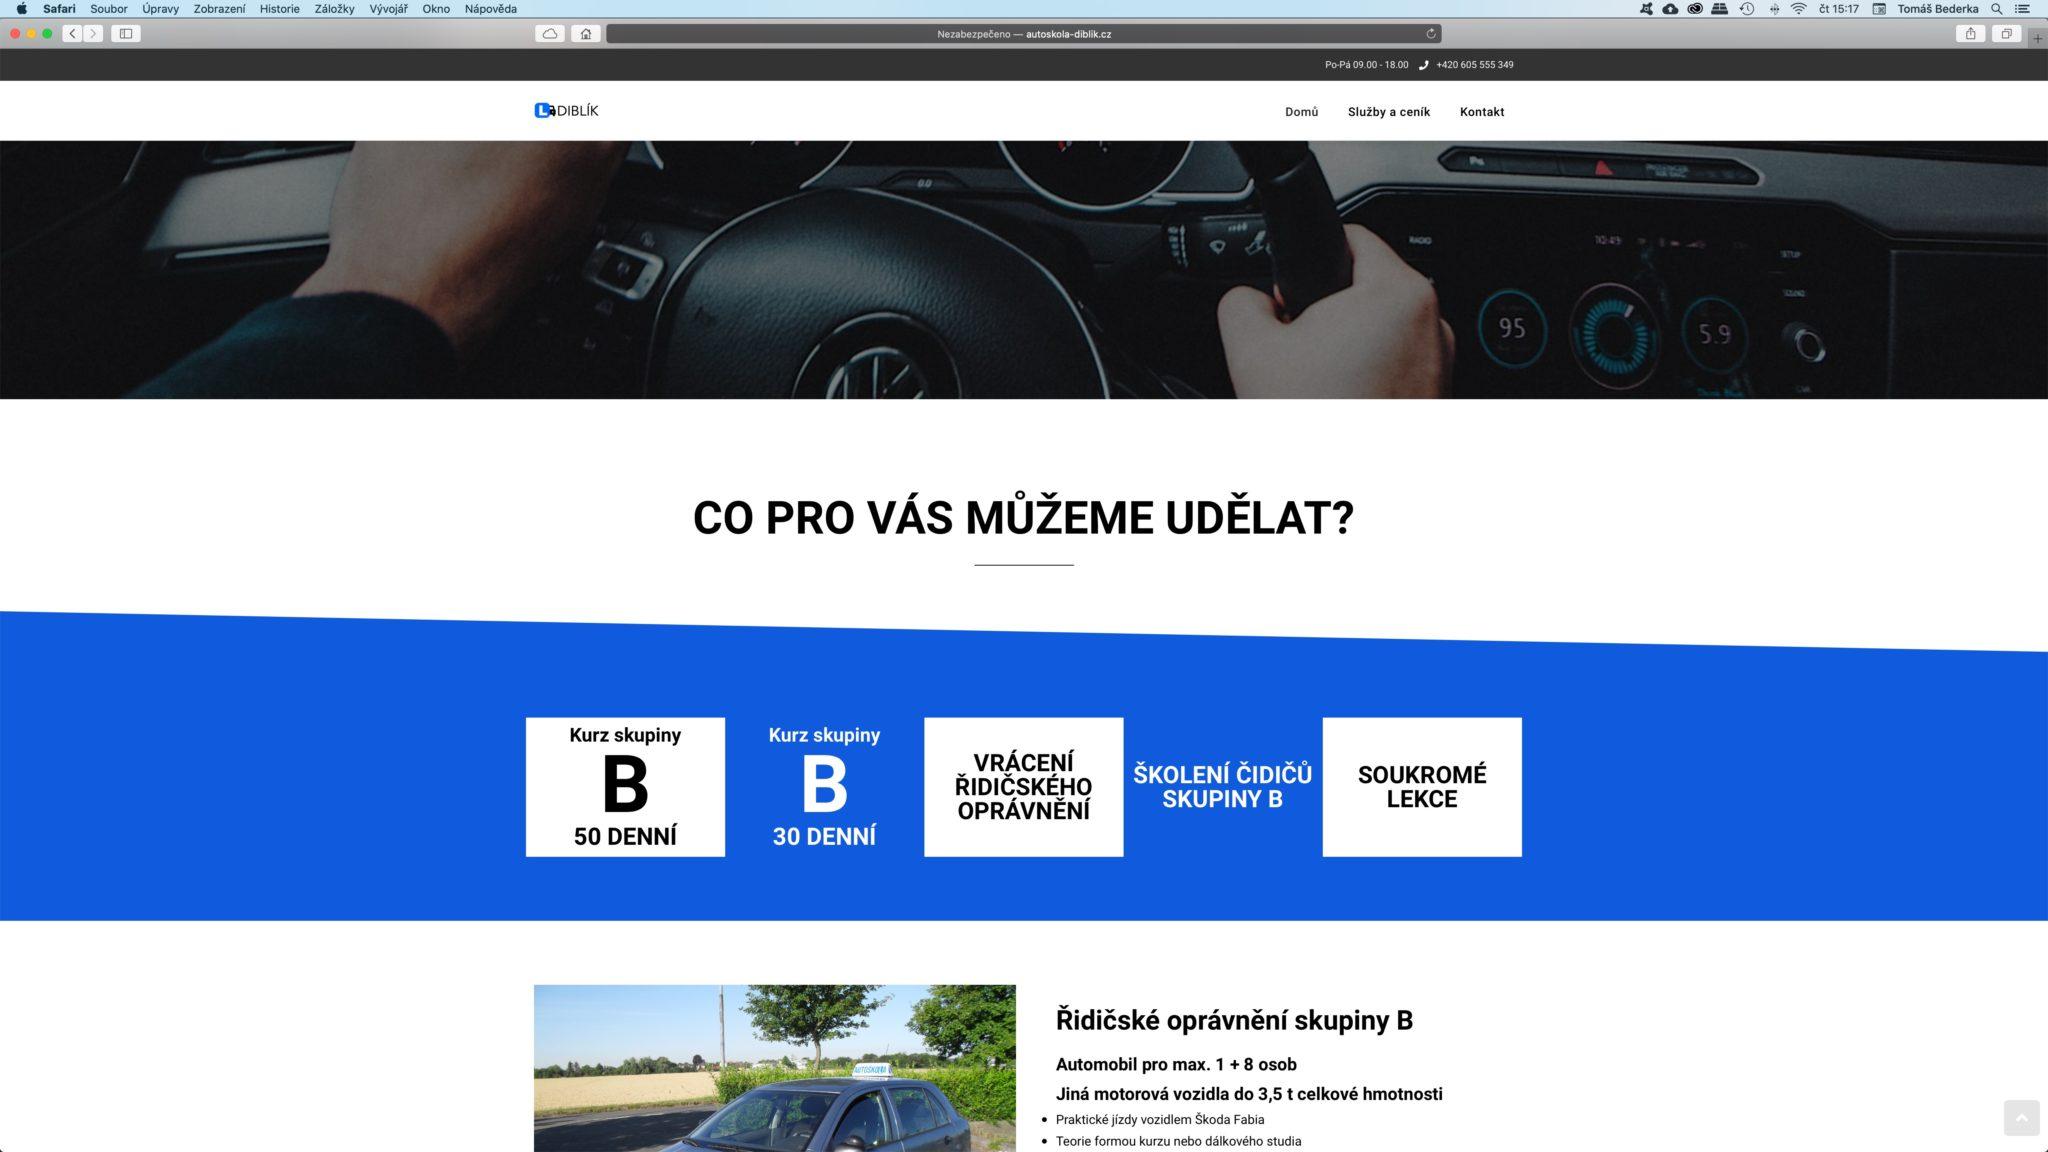 Autoškola-Diblík.cz